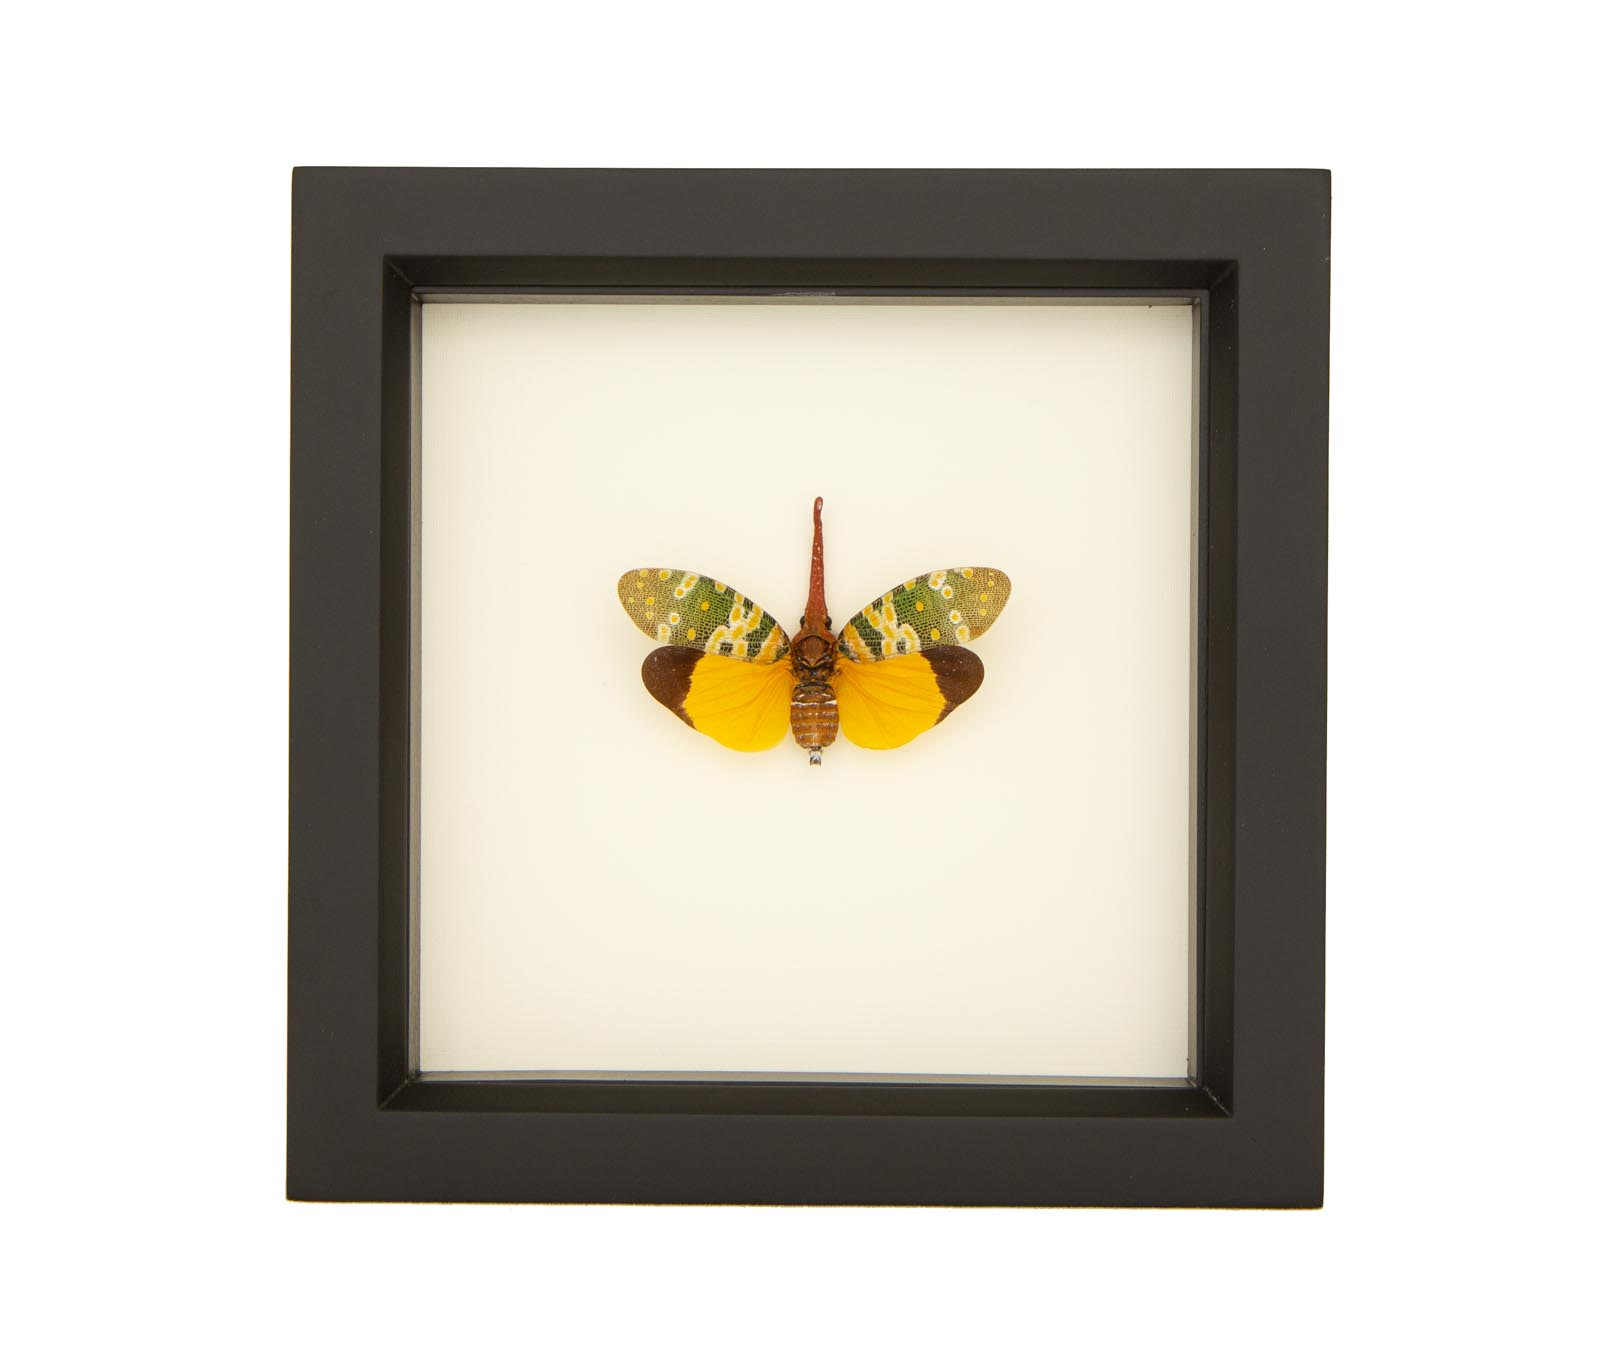 Bug art Real lantern bug with clear quartz and smokey quartz framed taxidermy art Oddities. Ethically sourced